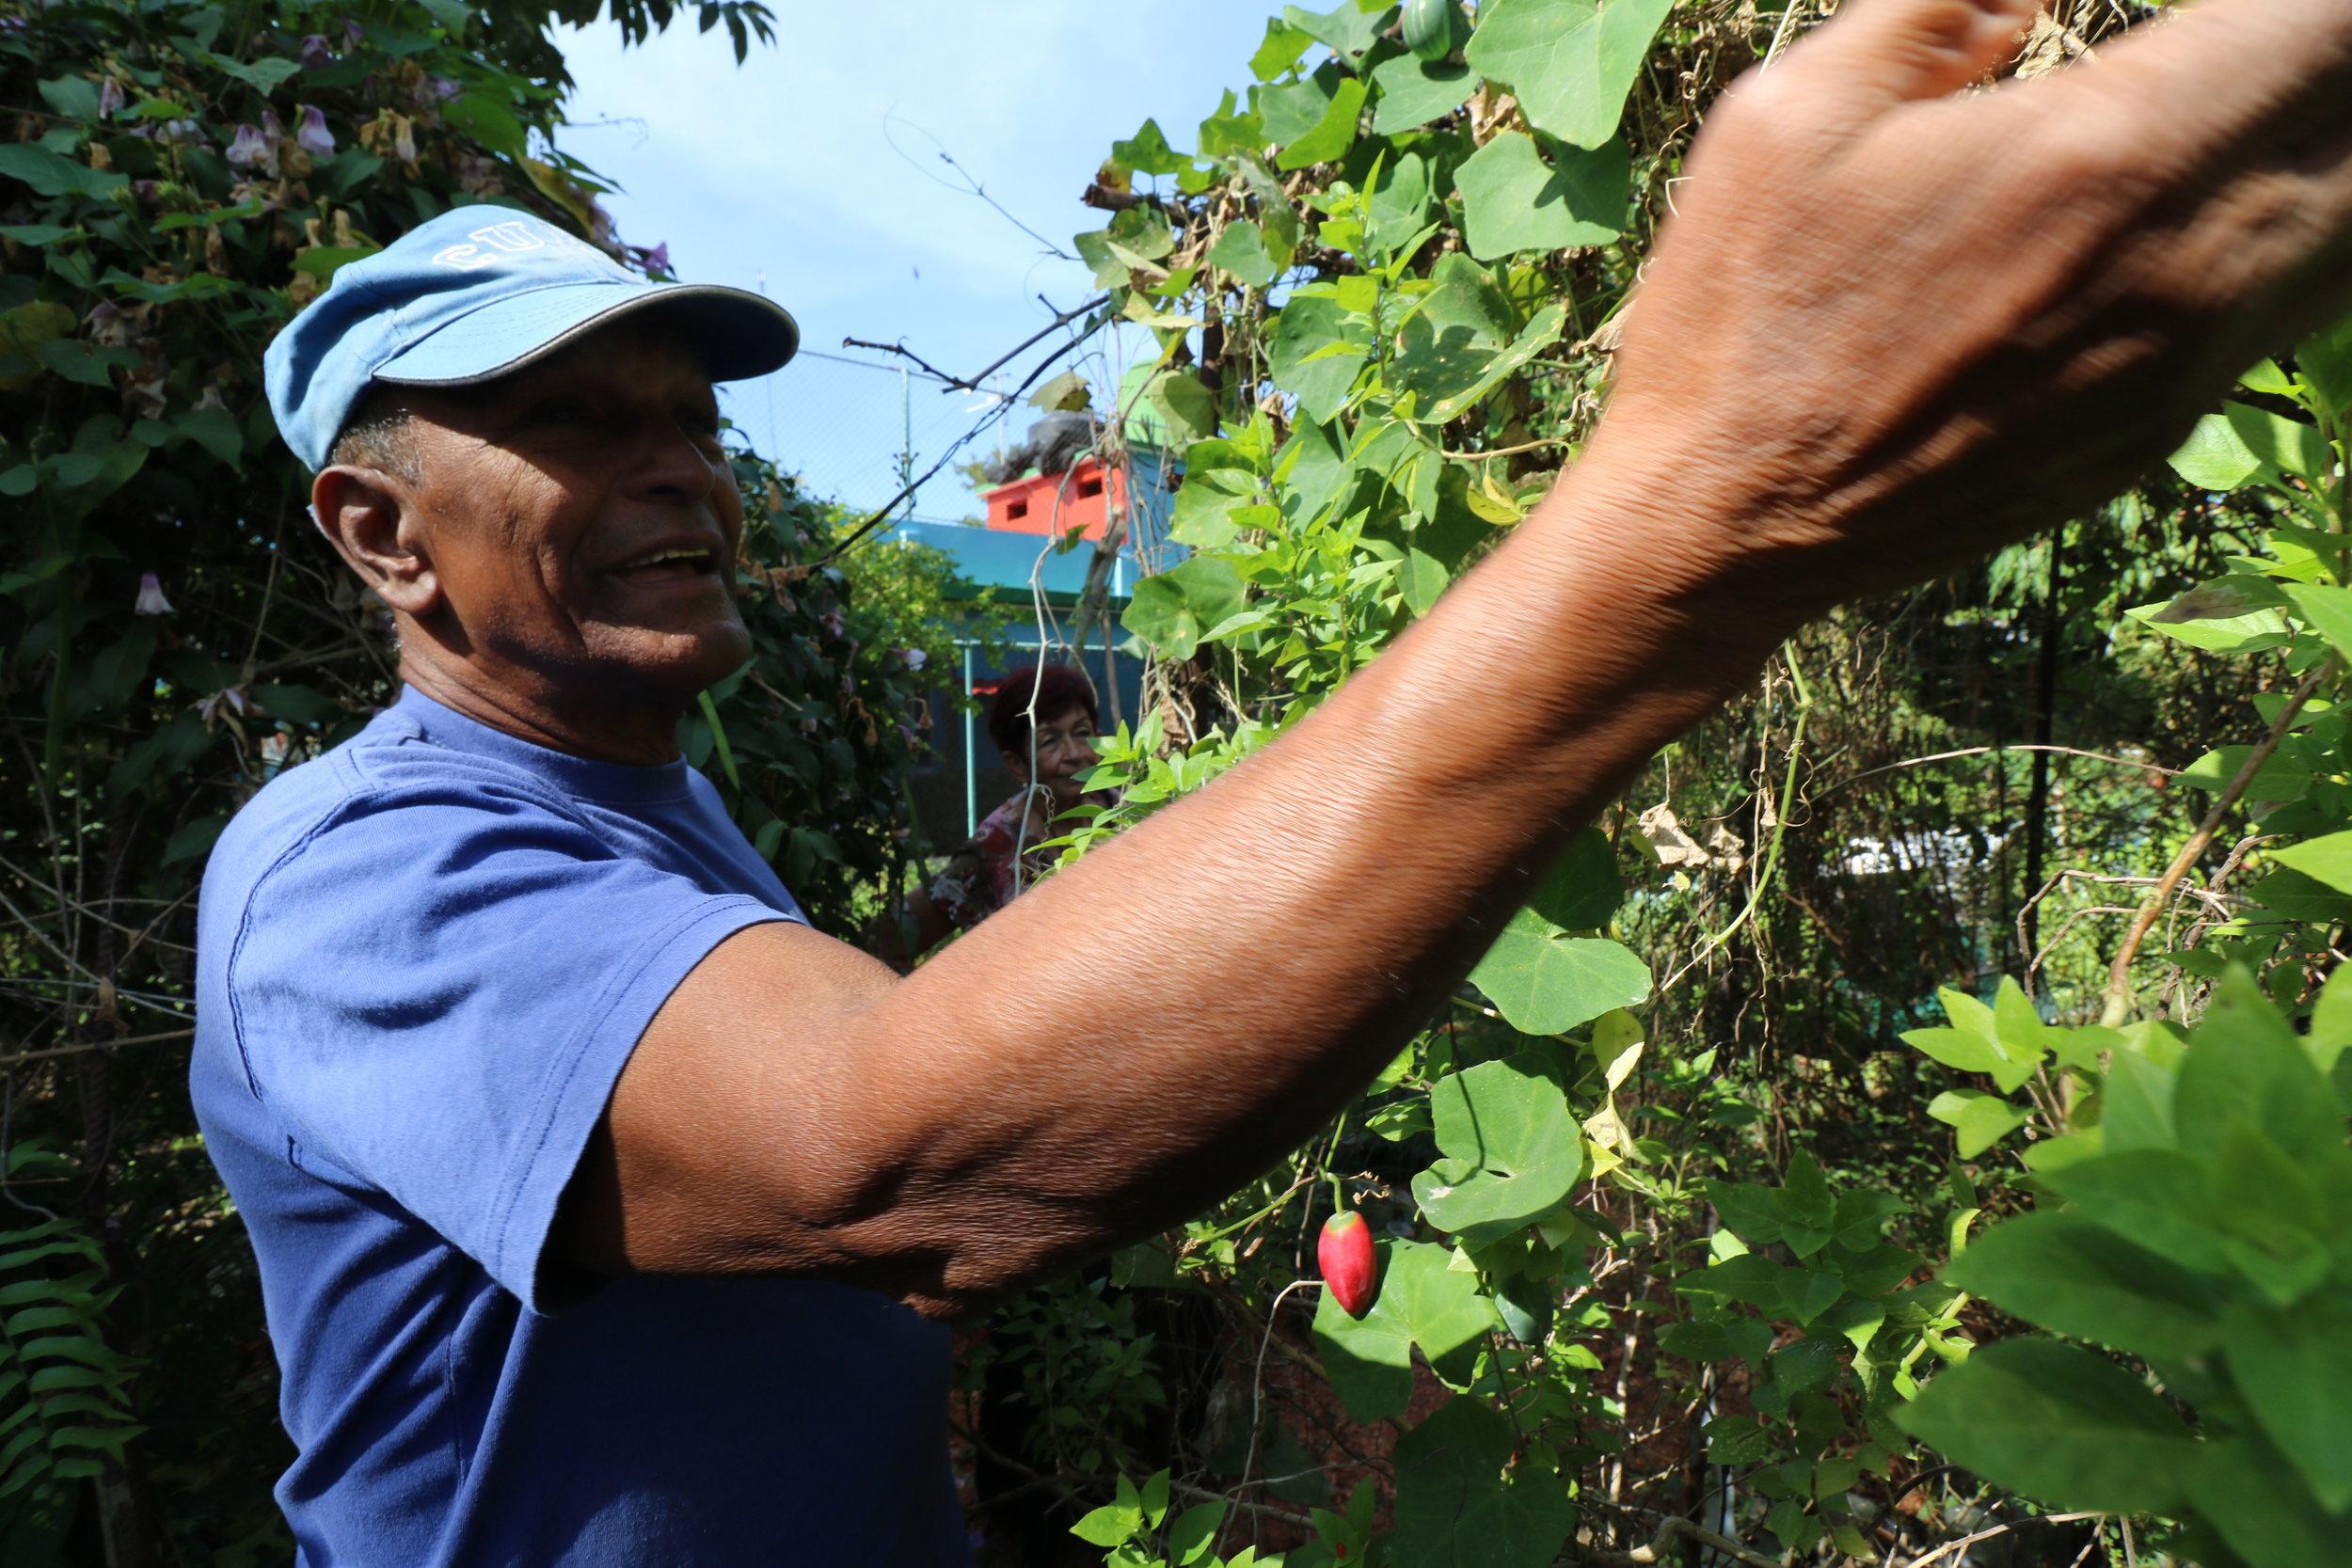 Permaculture farmer explaining his garden